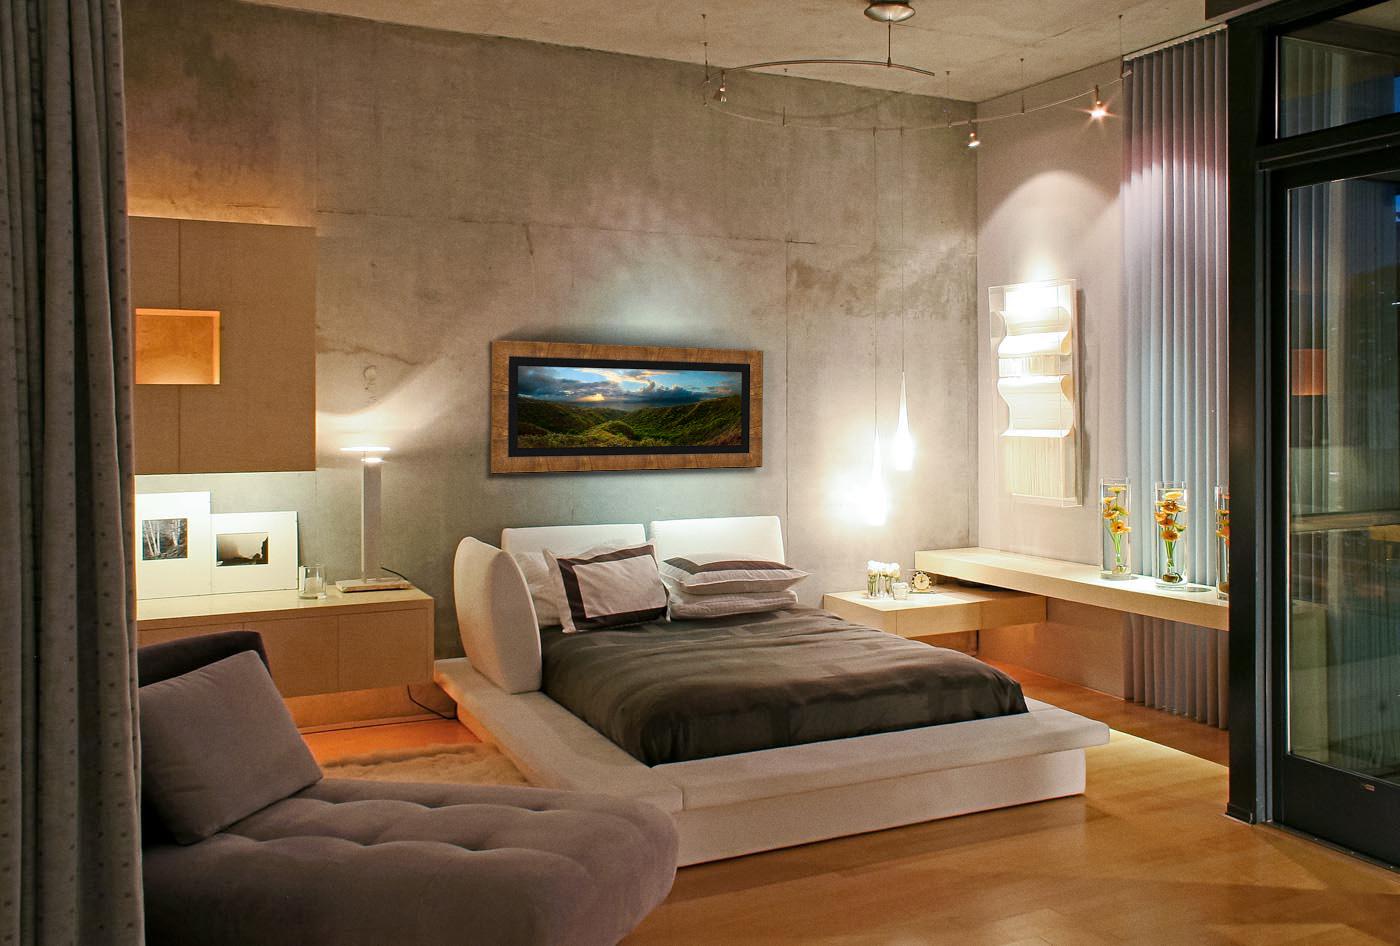 Molokai-Panorama-in-home-I.jpg